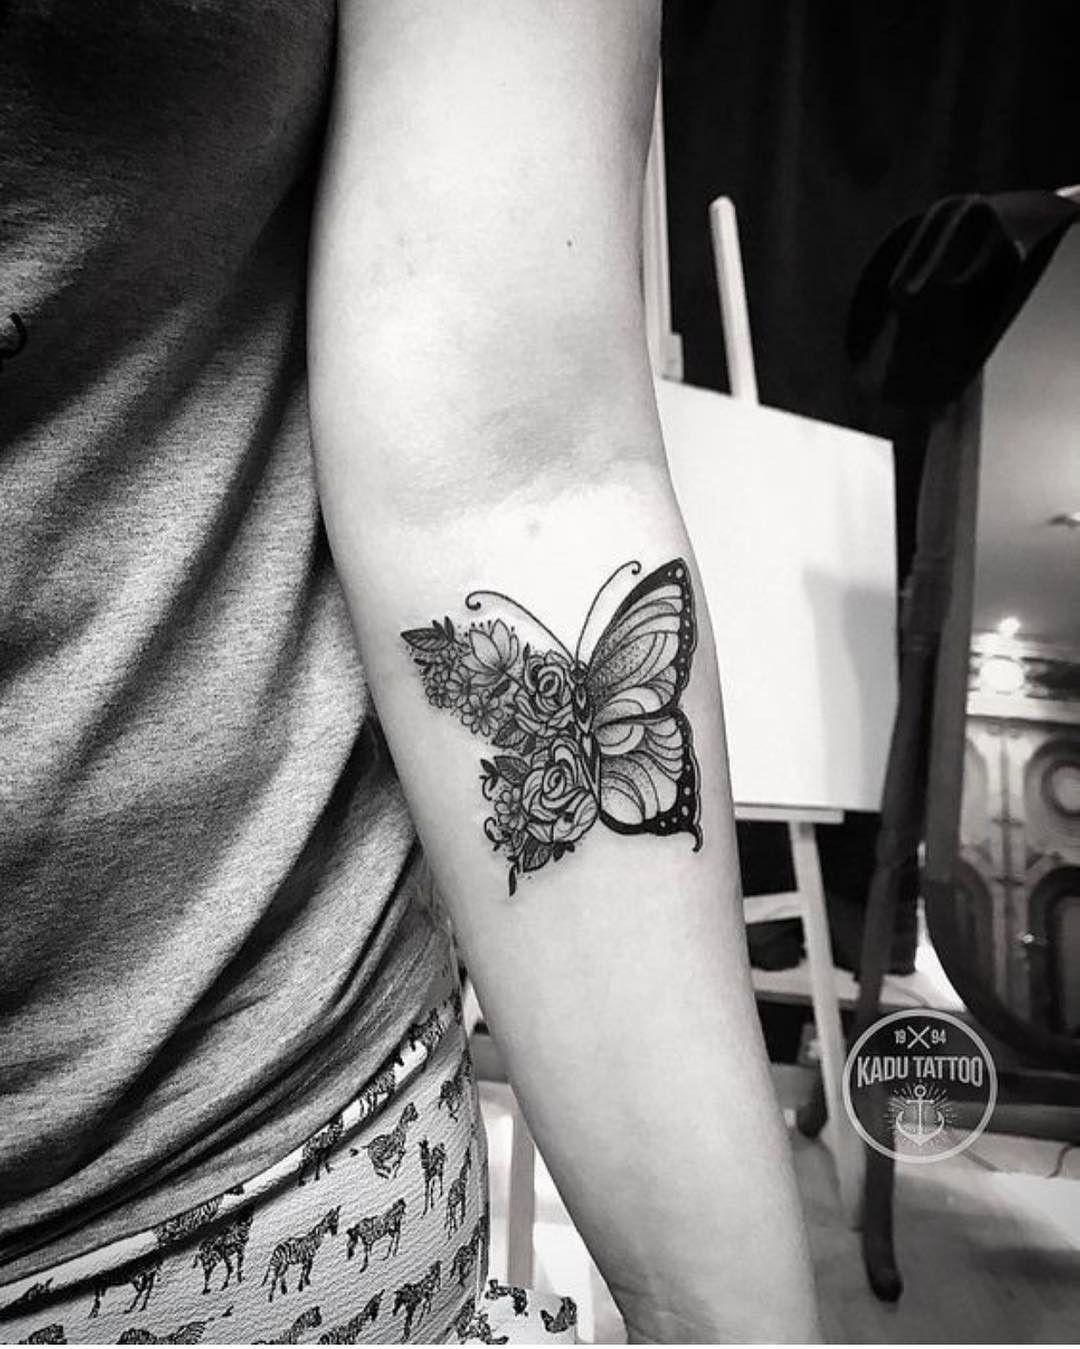 Lets Tattoo The World Xtatts On Instagram Cute Little Inner Arm Butterfly Piece Owner Kadu Tattoos Sleeve Tattoos Butterfly Tattoo